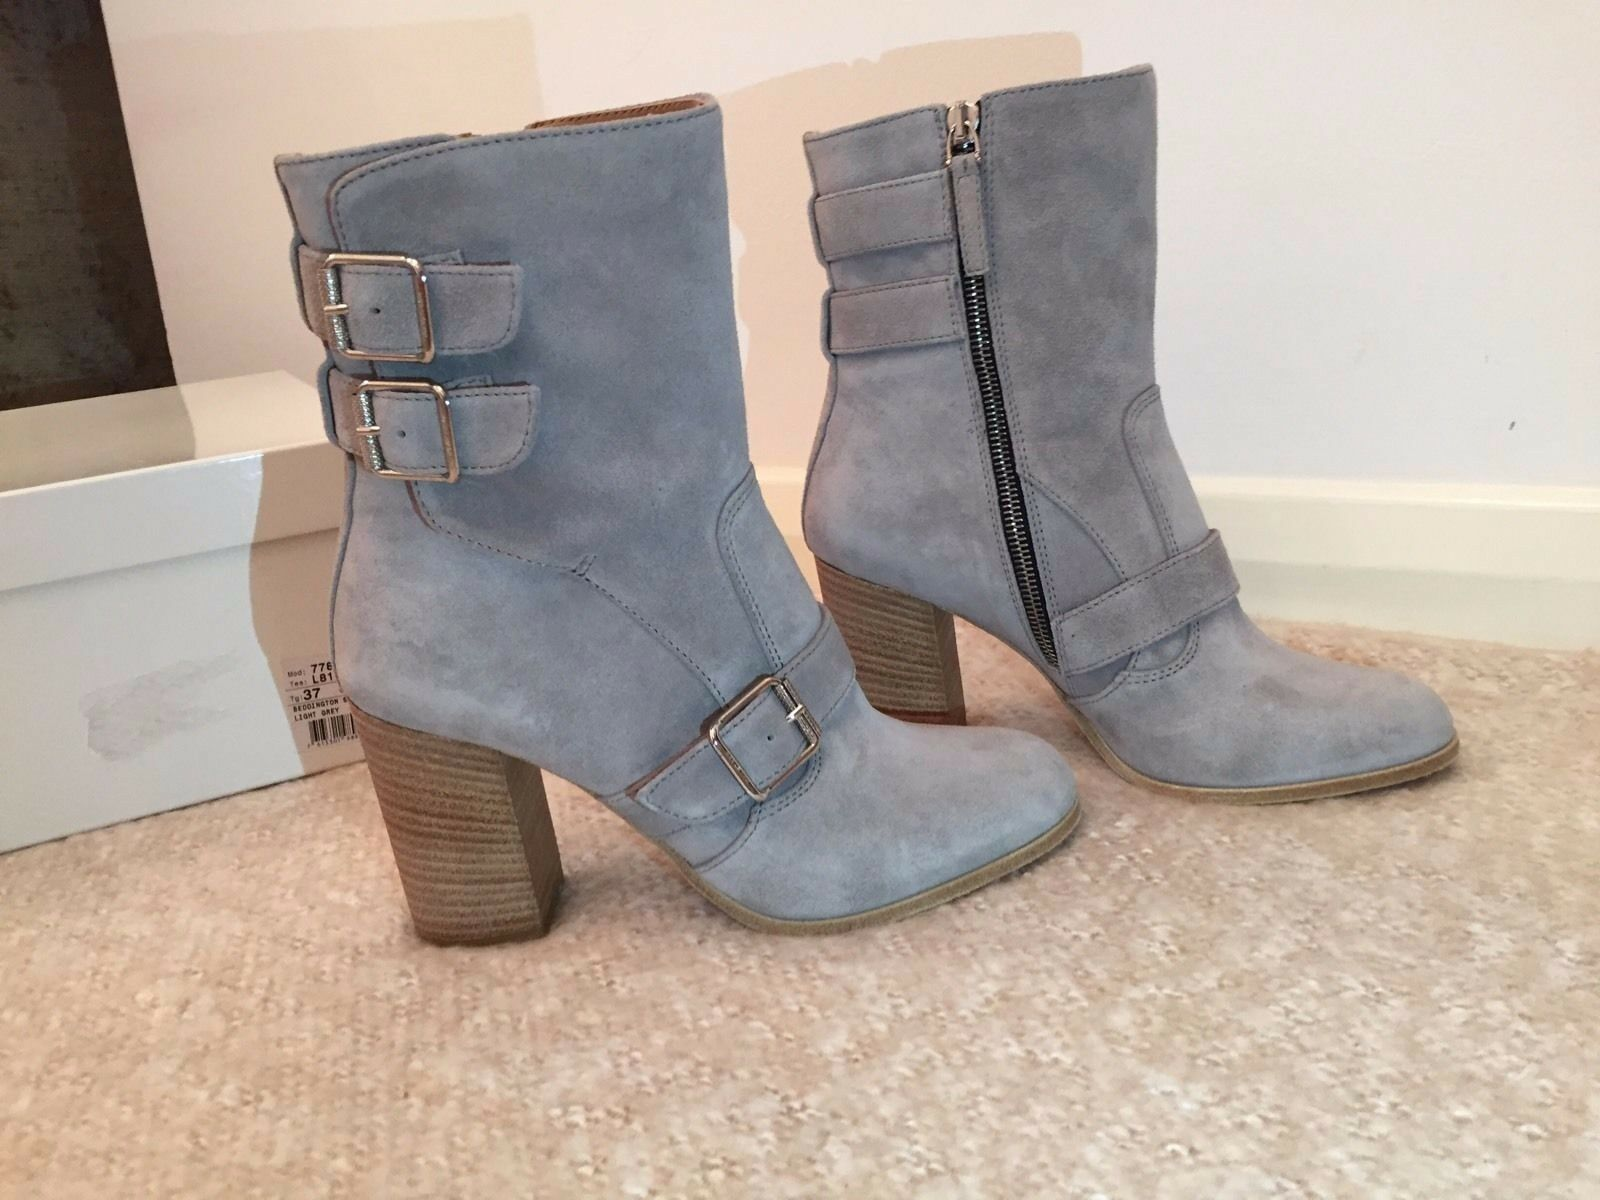 Belstaff damen Bedlington High Heel Suede grau Stiefel Größe 37 UK 4 BNWB